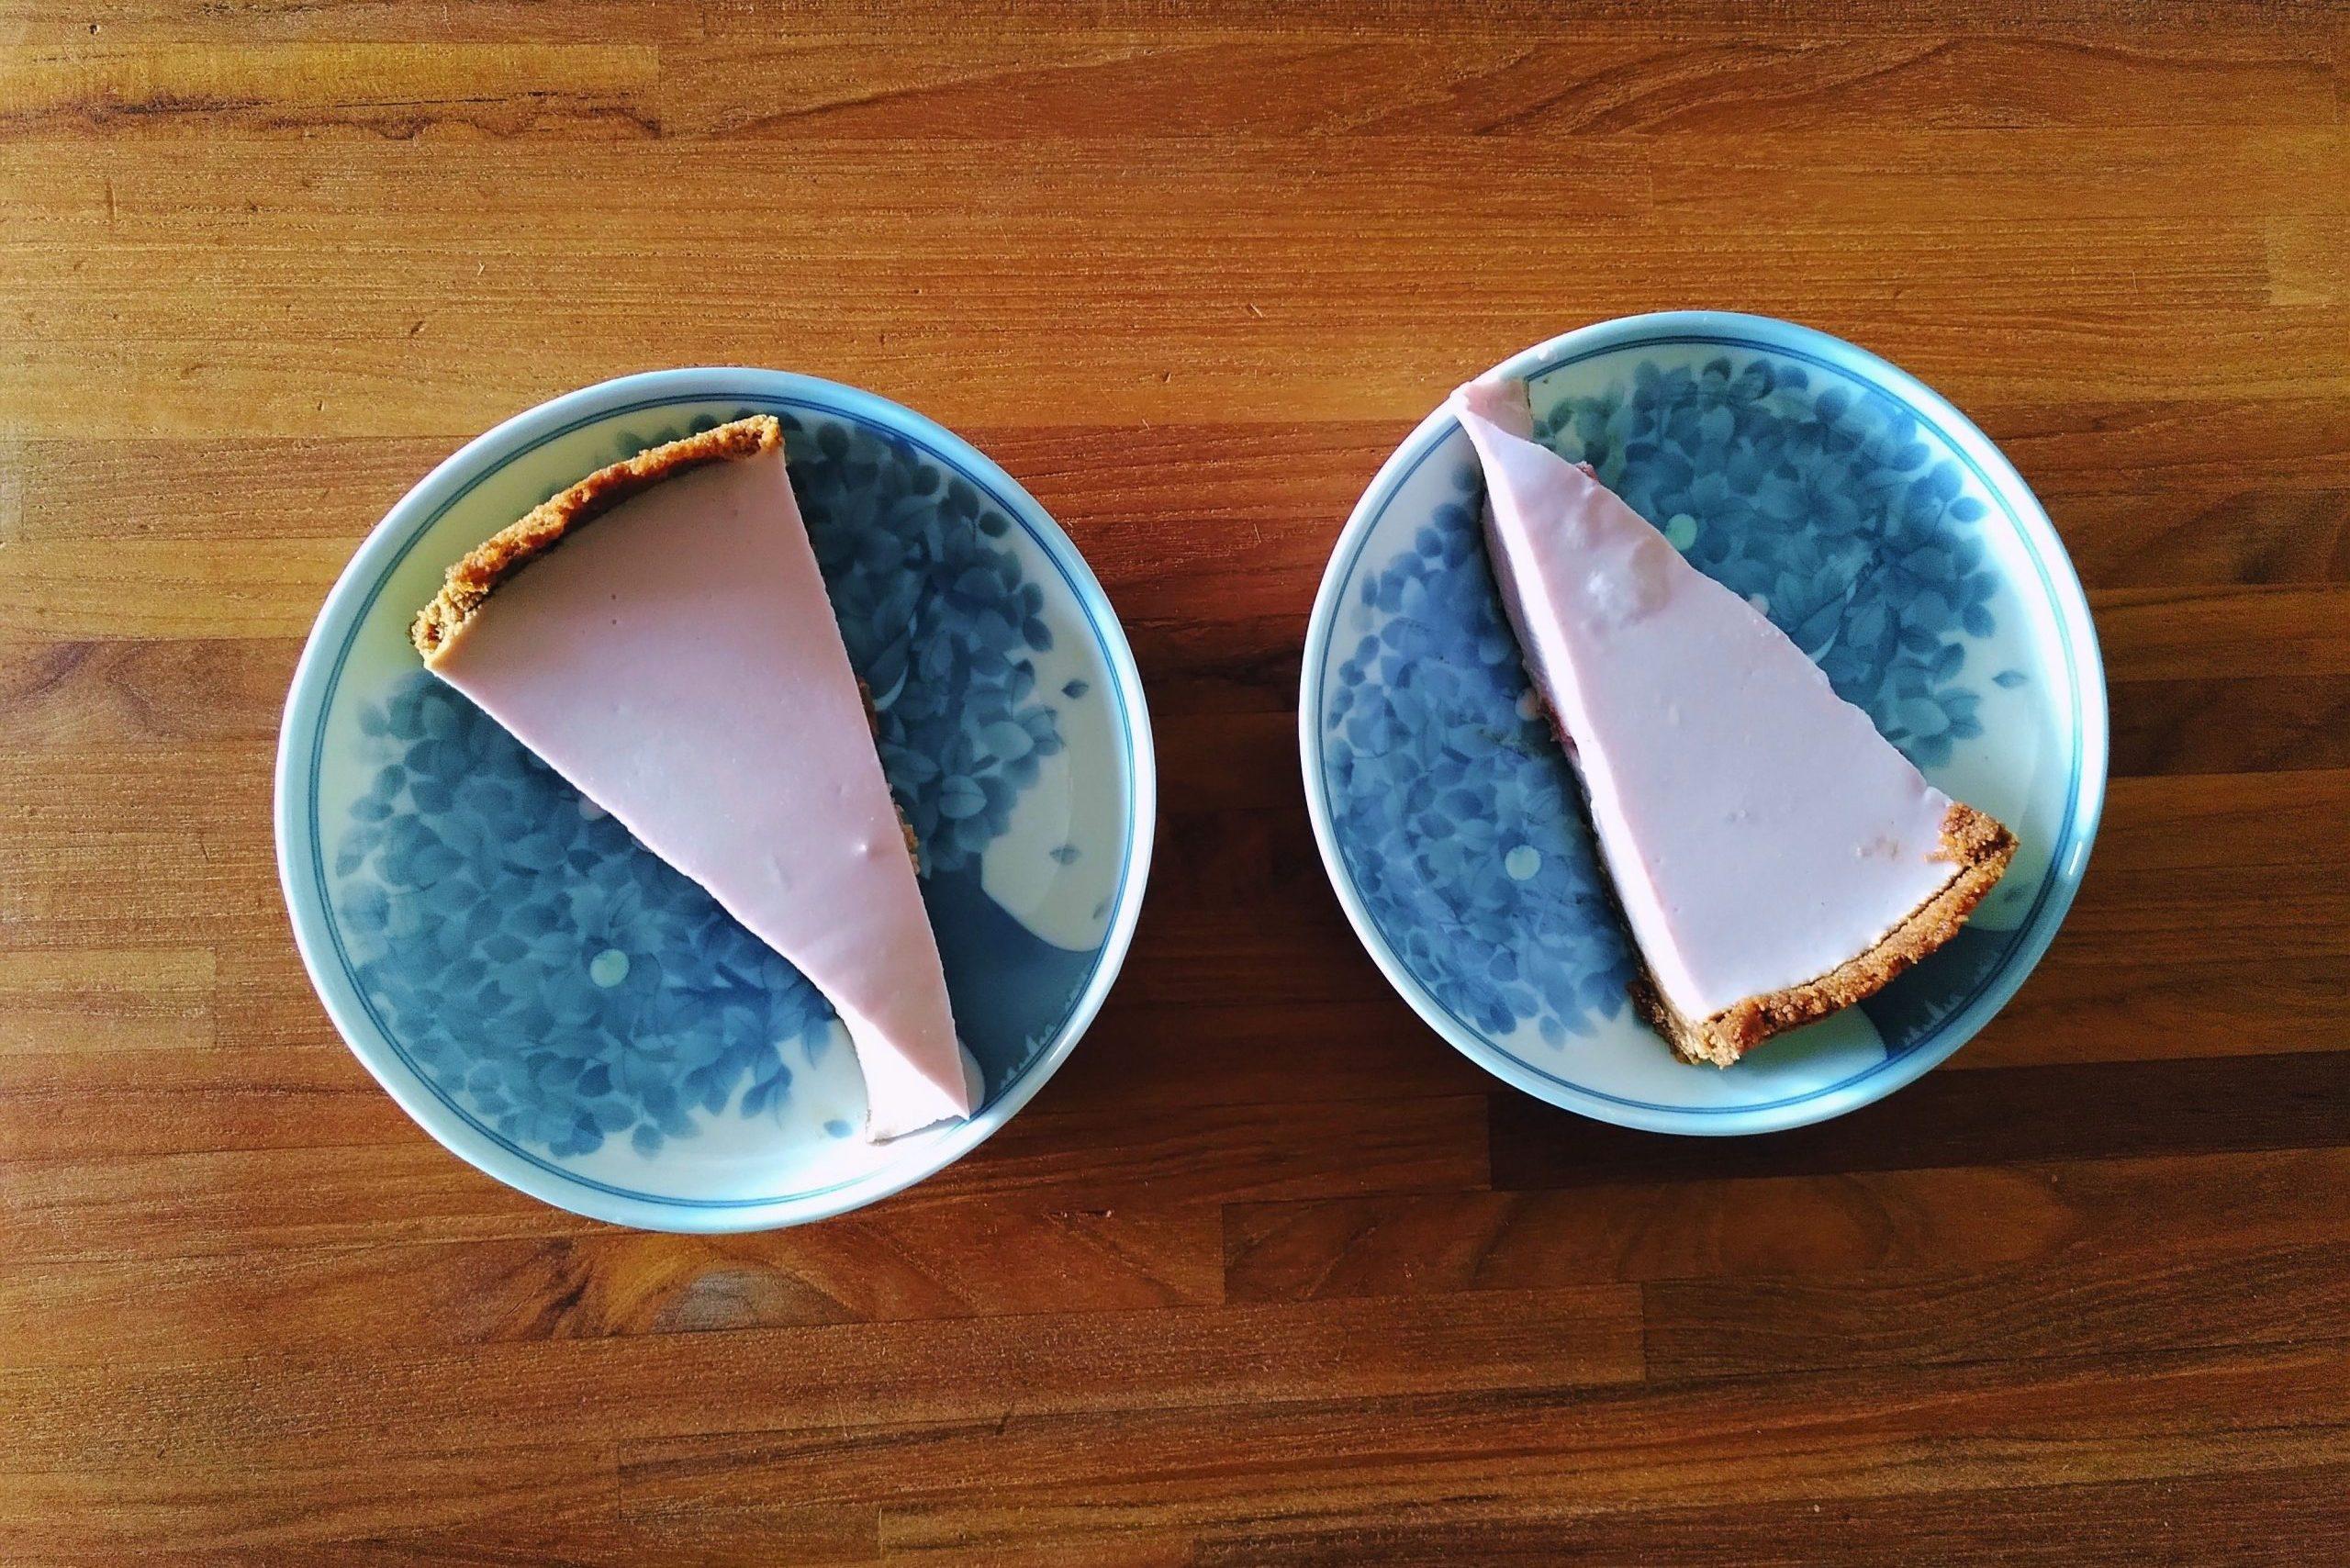 Easy vegan cherry 'cheesecake' recipe (nut-free!)